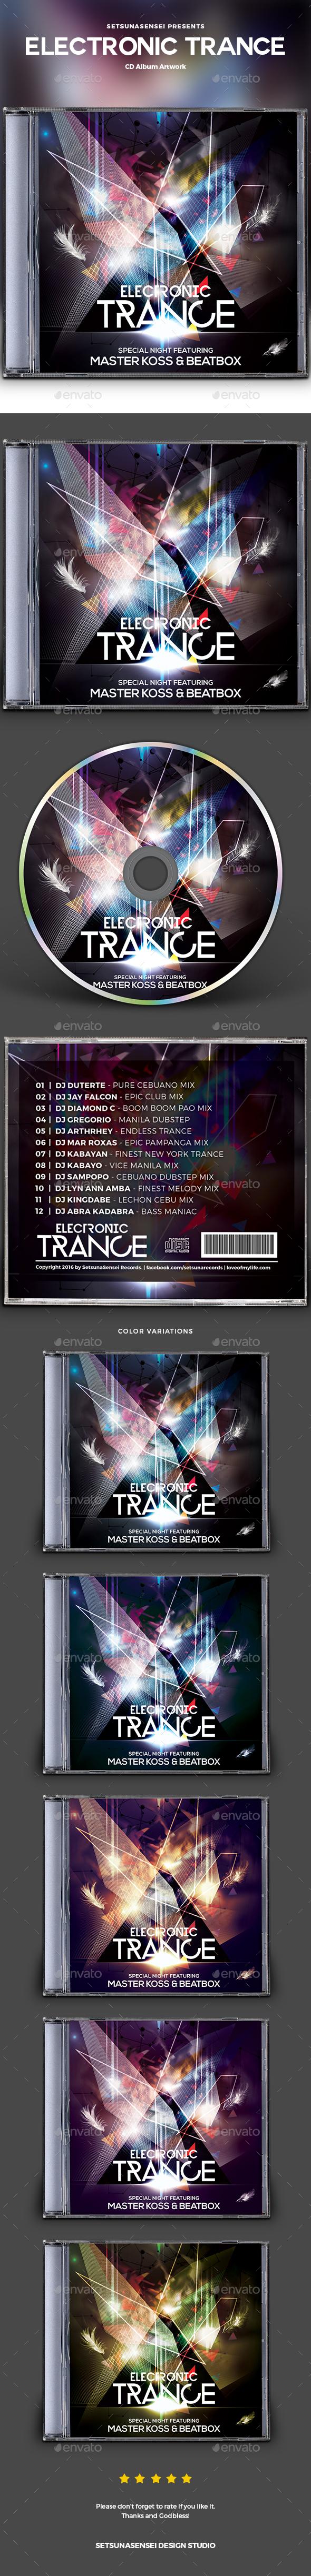 Electronic Trance CD Album Artwork - CD & DVD Artwork Print Templates